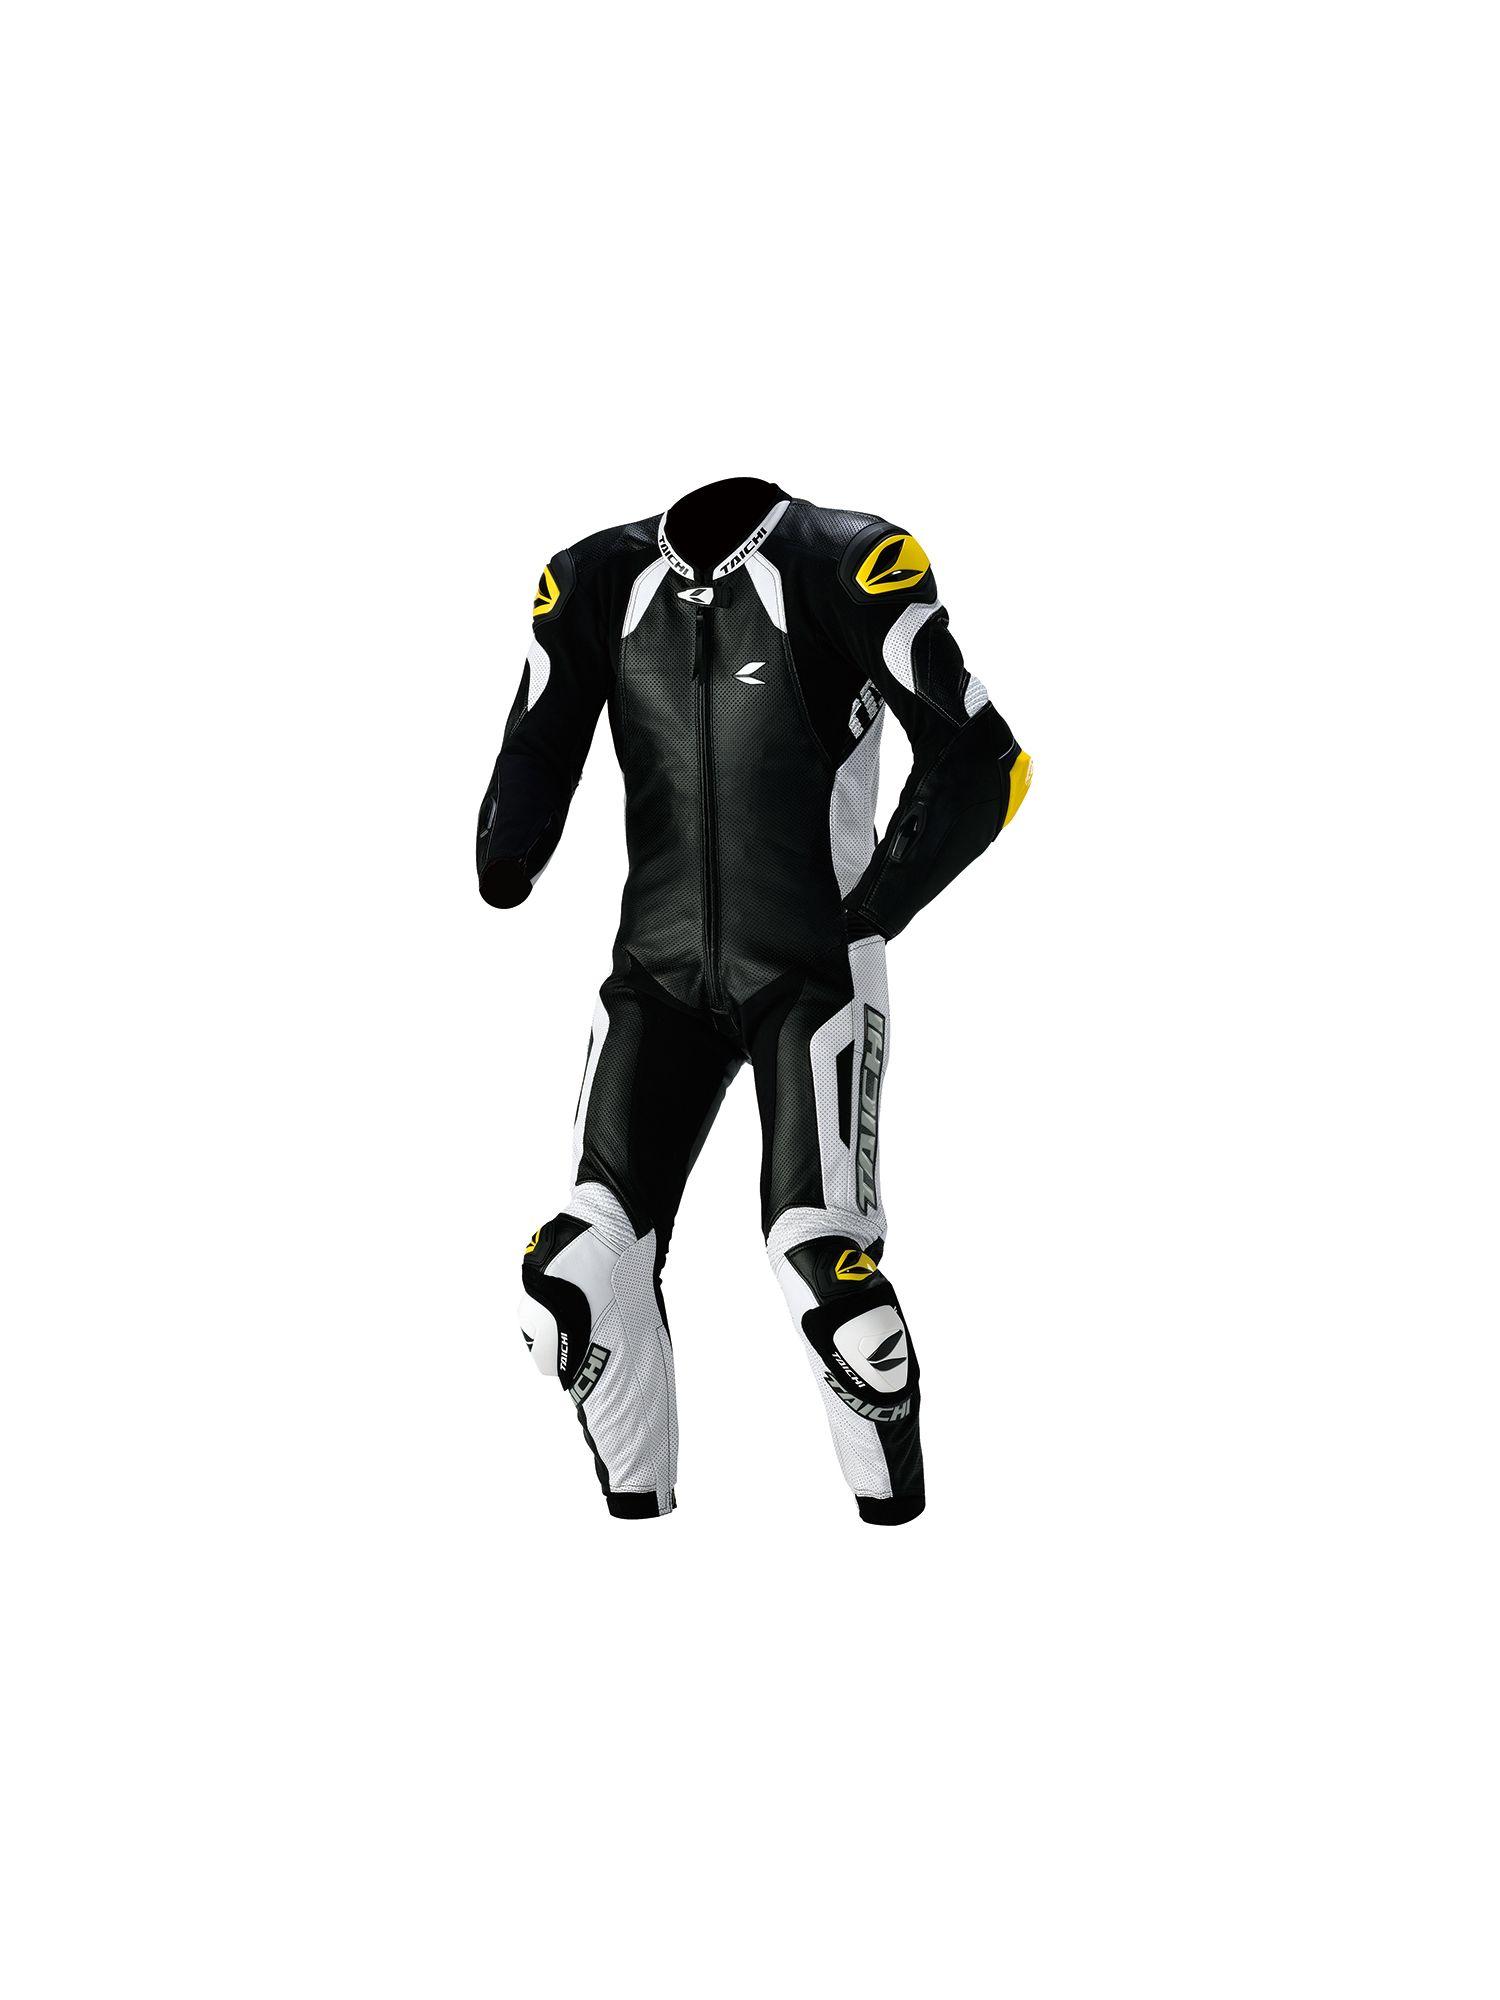 NXL108 | GP-EVO. R108 RACING SUIT